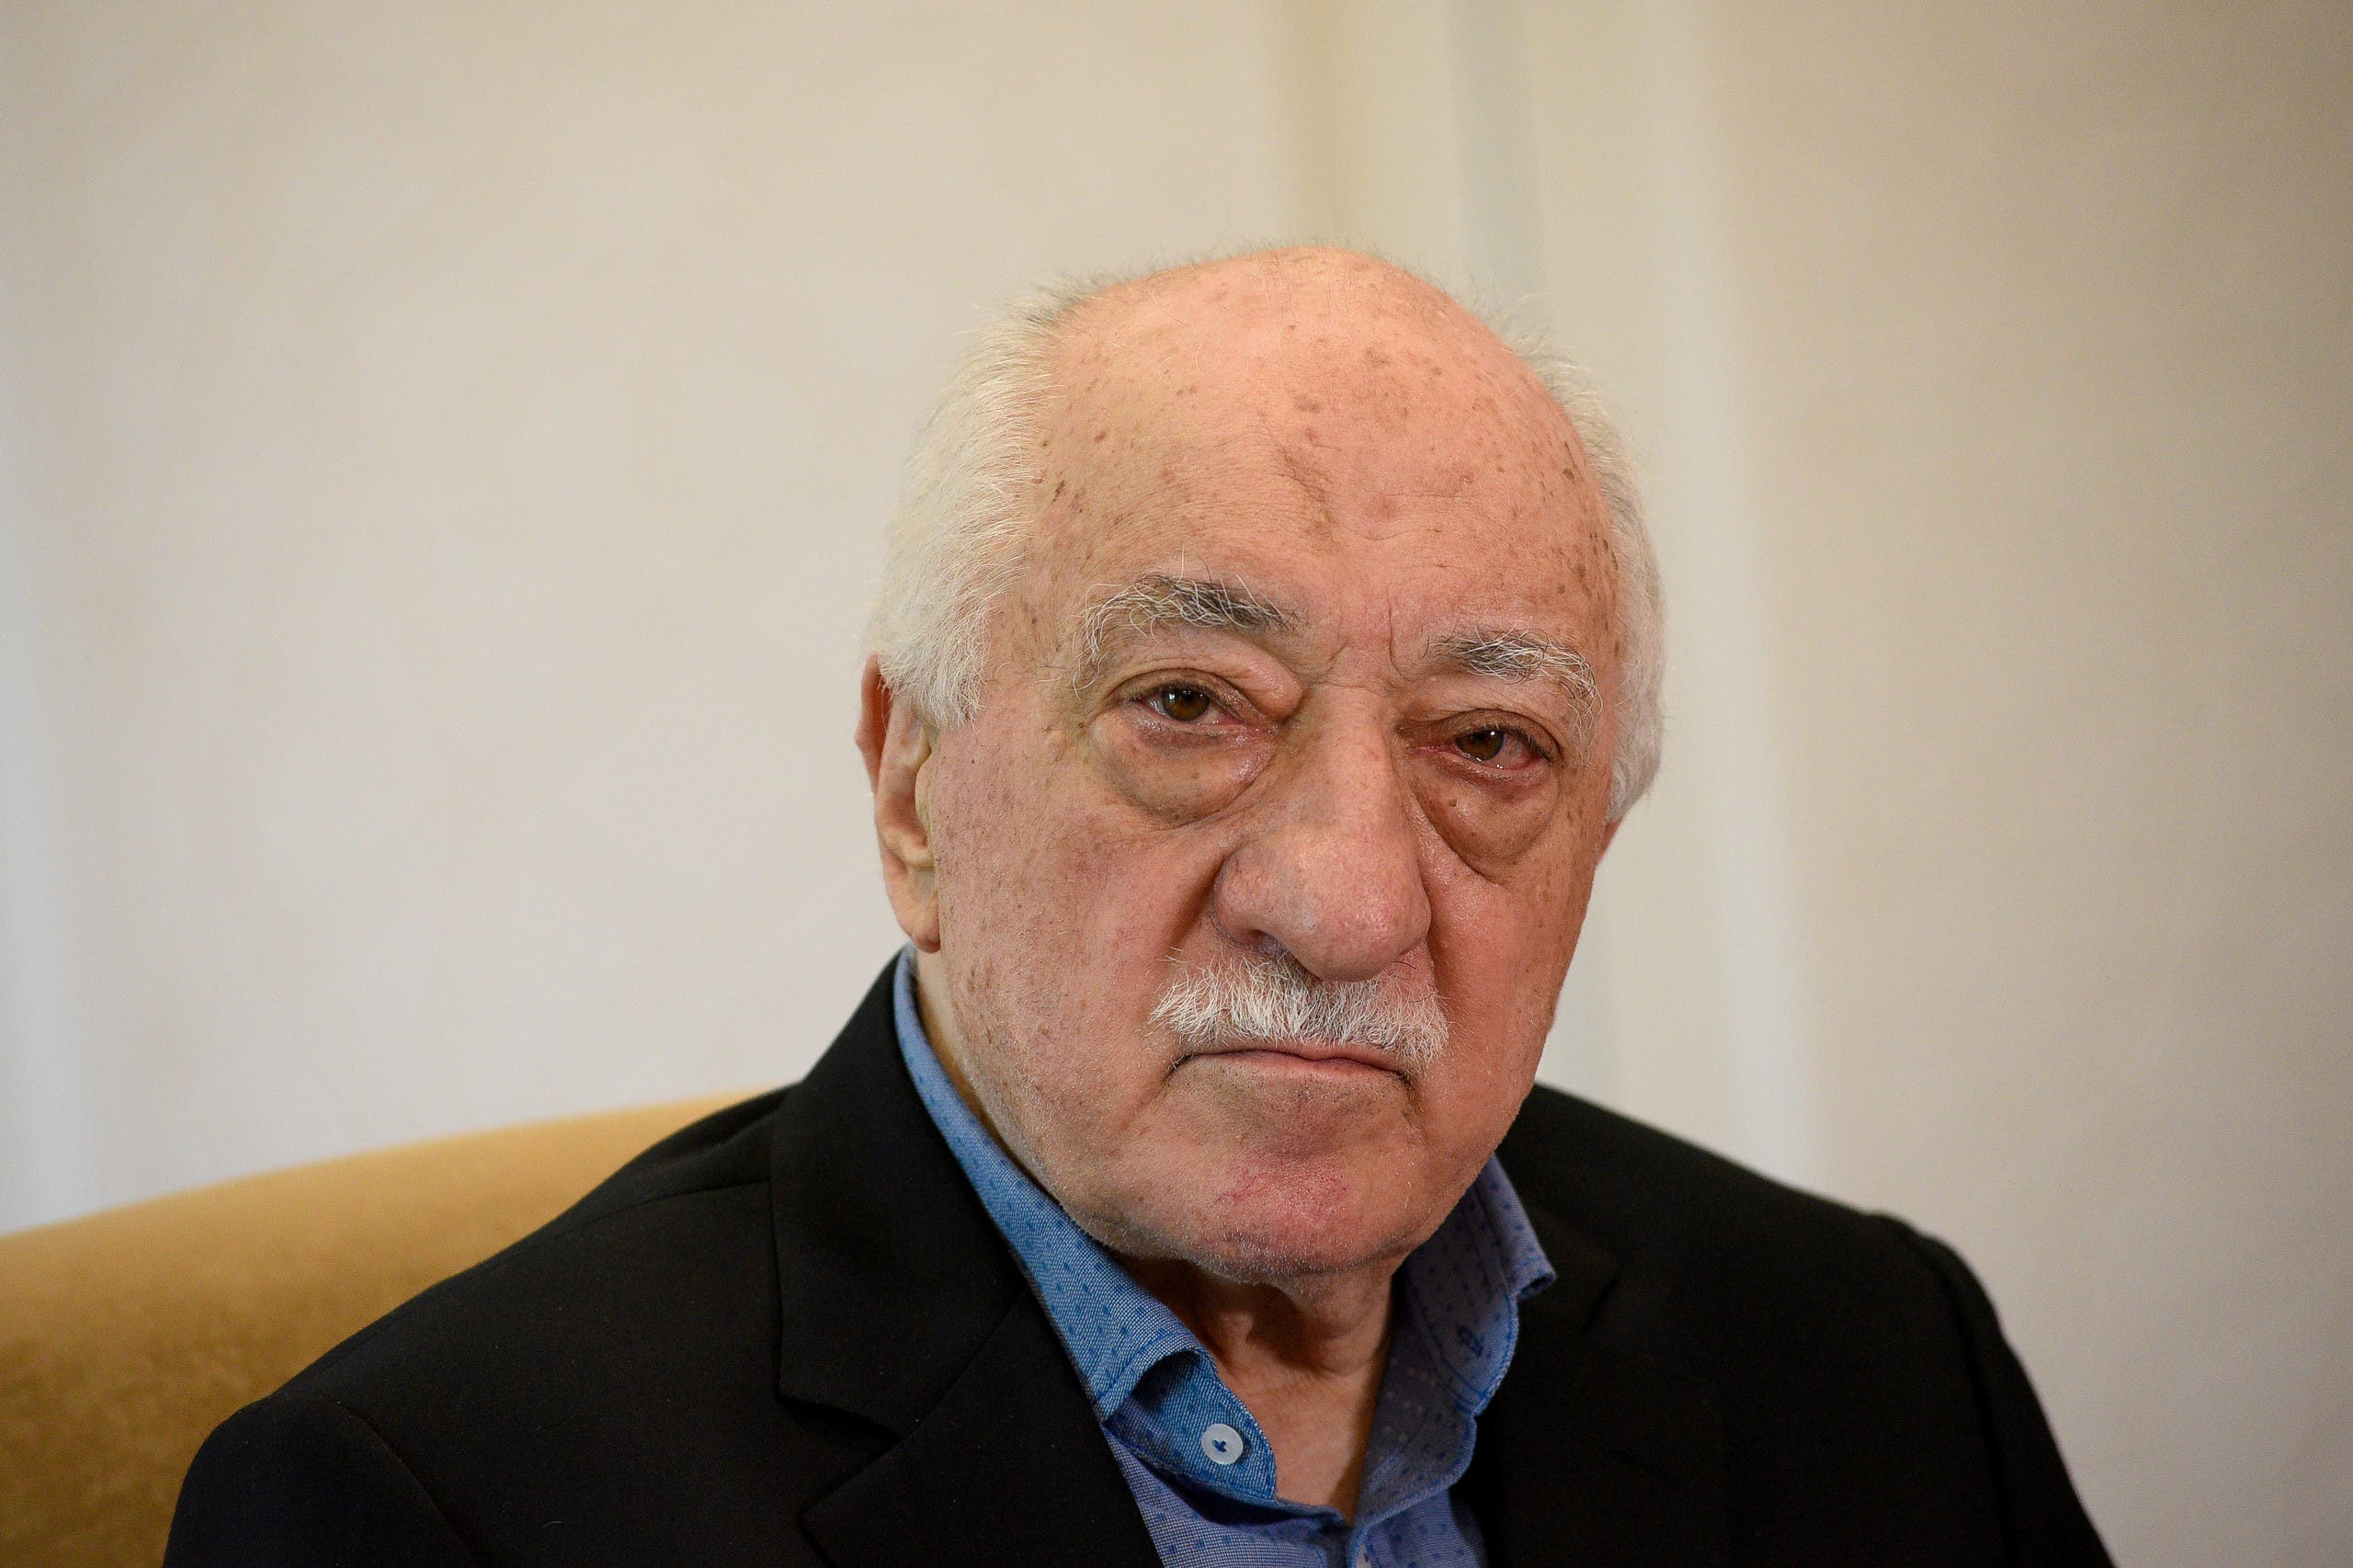 US.-based Turkish cleric Fethullah Gulen at his home in Saylorsburg, Pennsylvania. (File photo: Reuters)